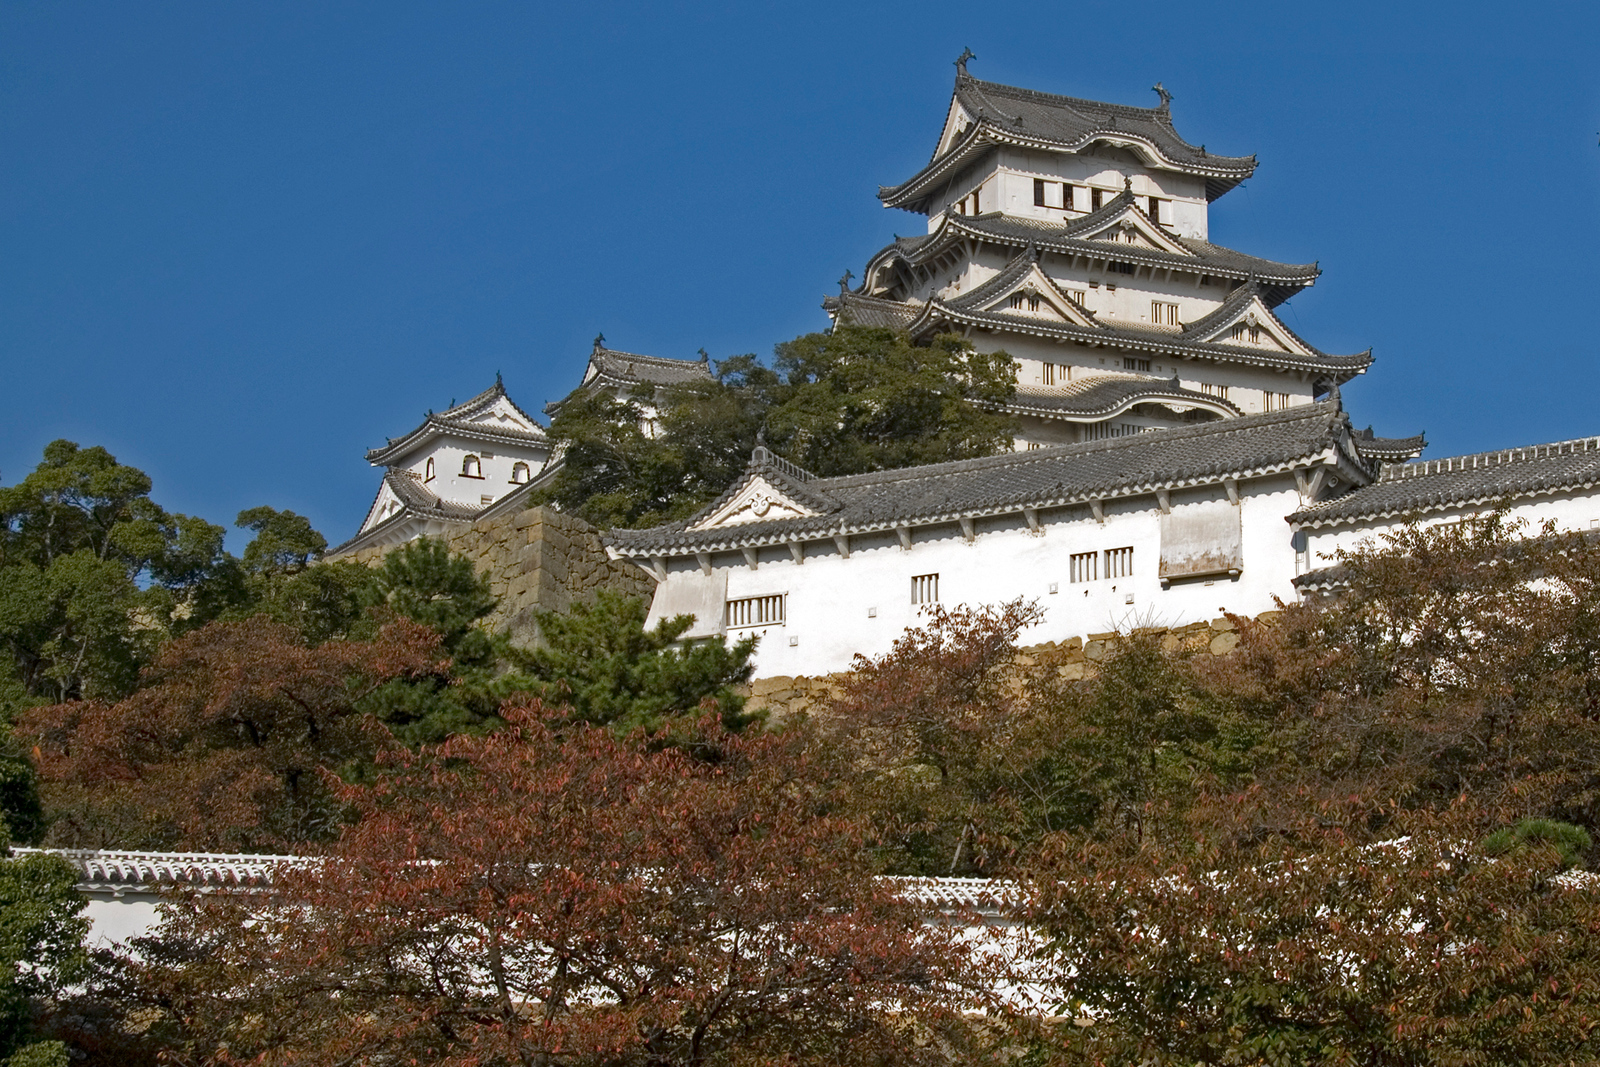 UNESCO World Heritage Site: Himeji-jo